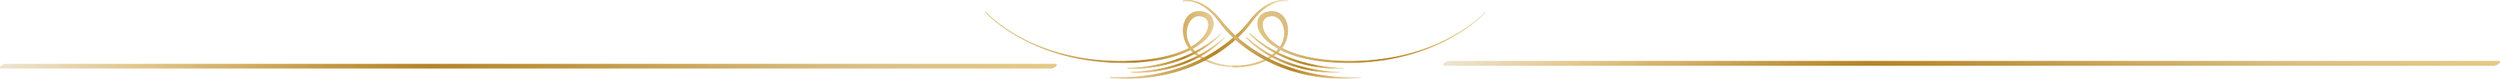 line and swirl.jpg